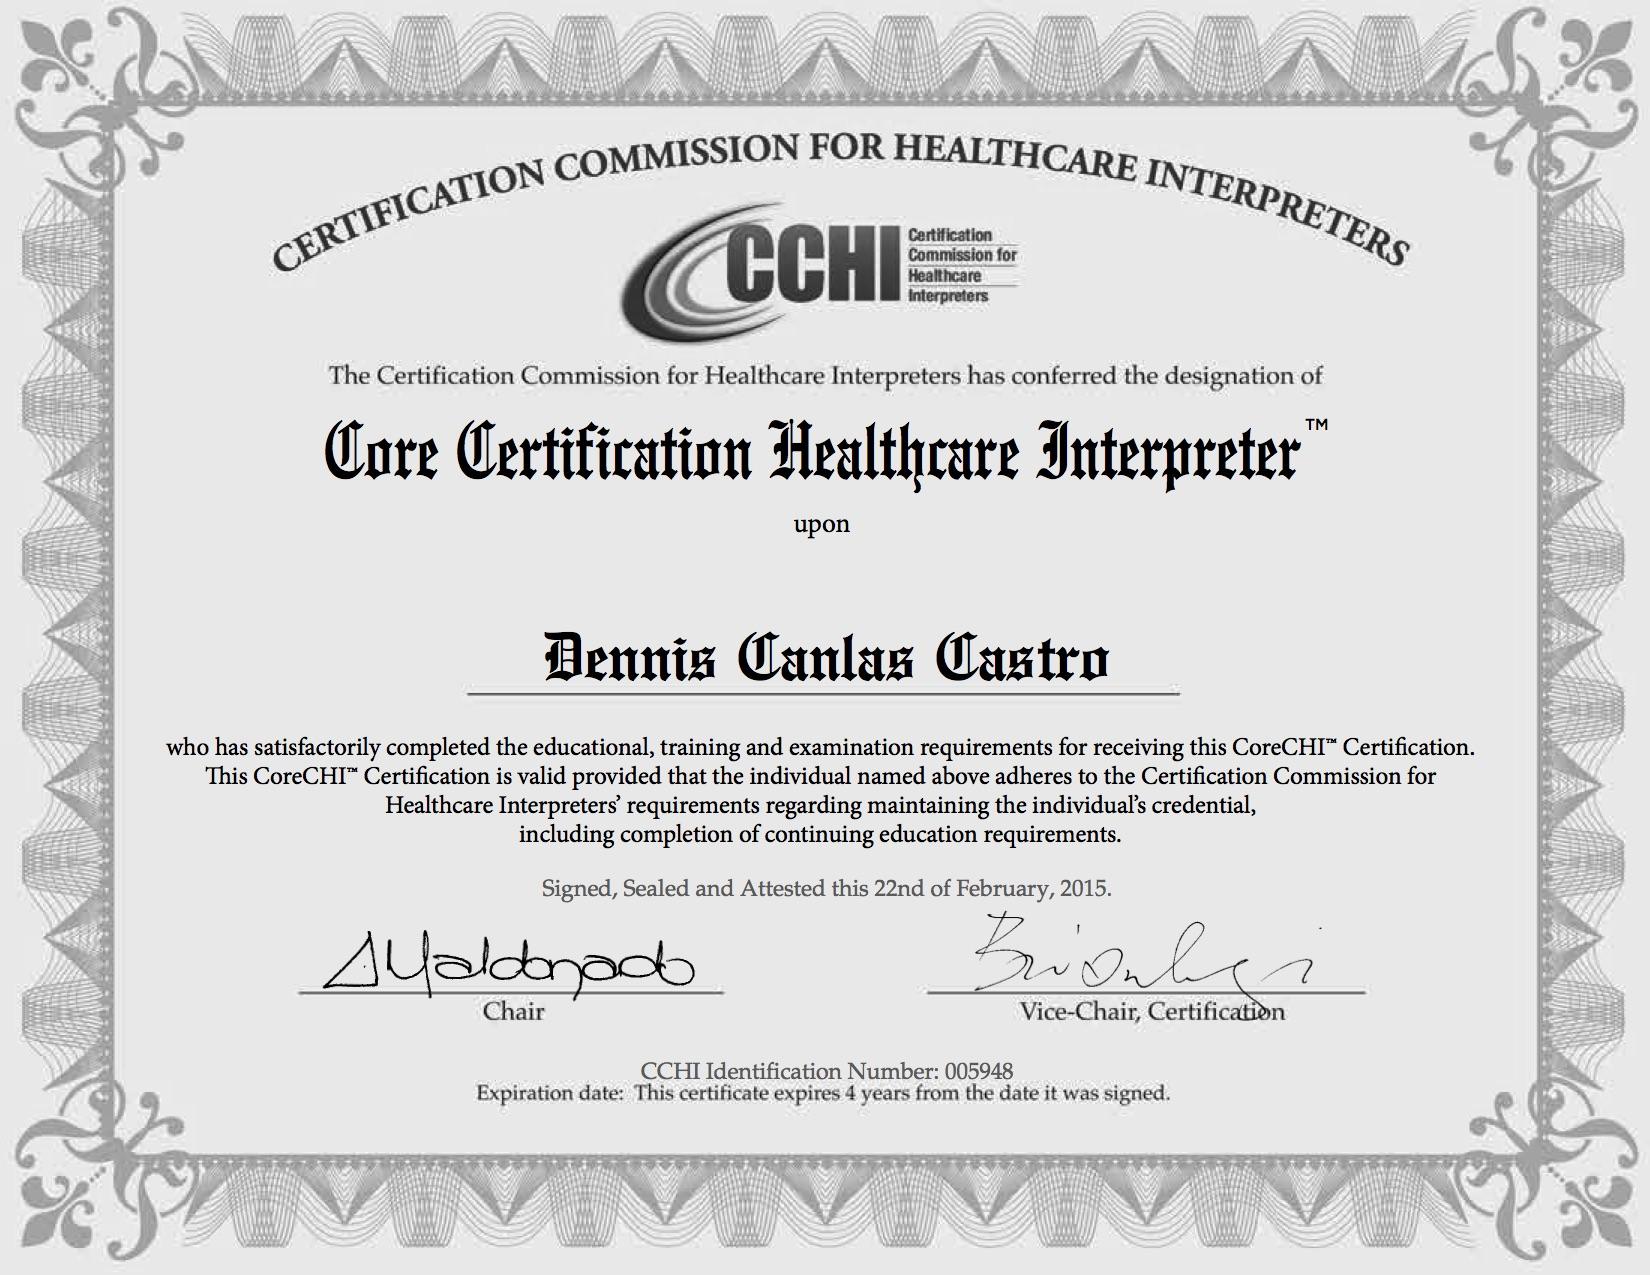 CCHI Certification